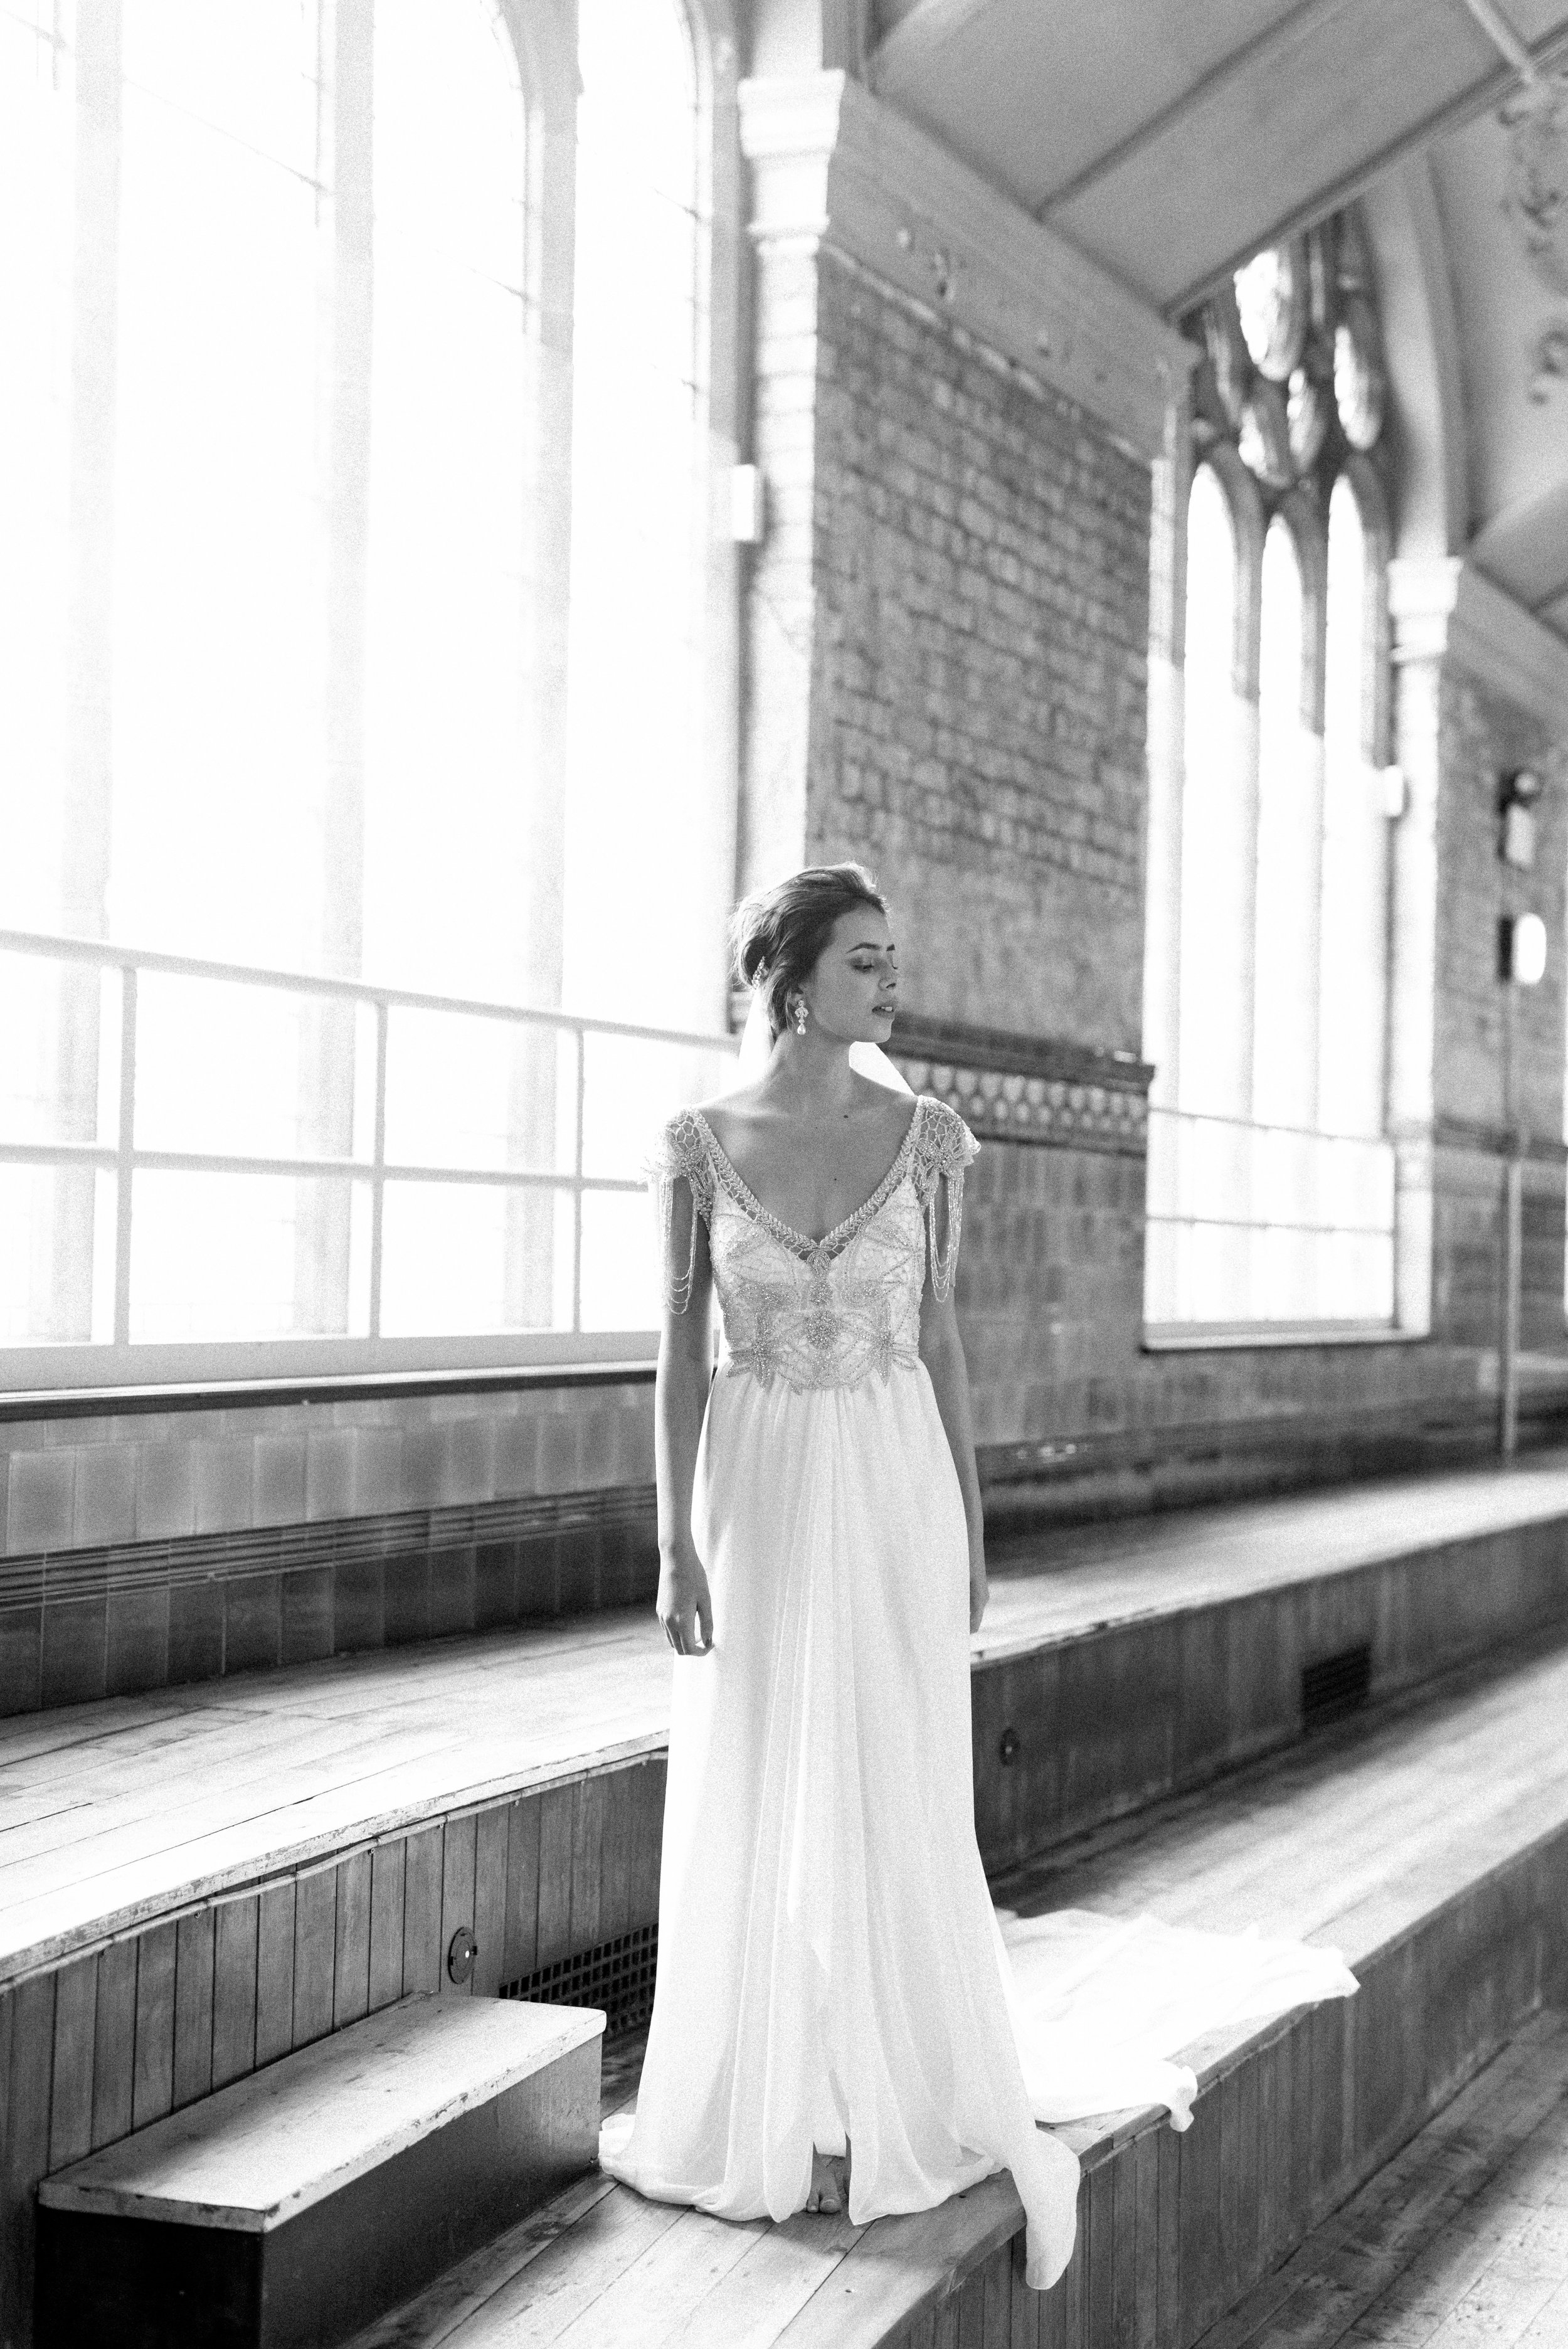 Anna Campbell Bridal   Grace Dress   Vintage Inspired Beaded Wedding Dress   Eternal Heart Collection